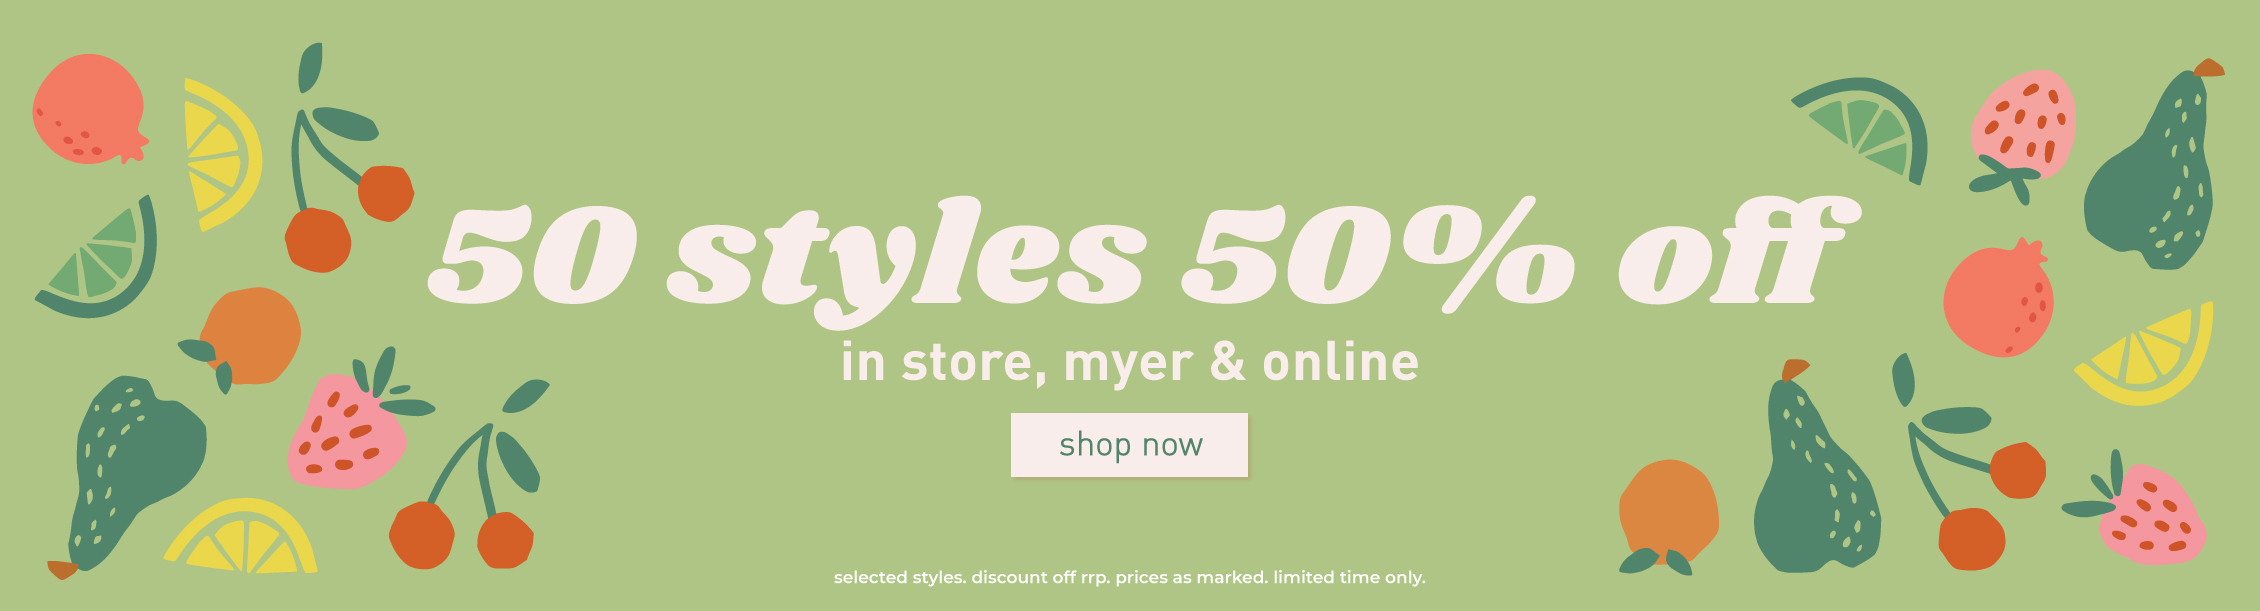 desktop_50 styles 50% off